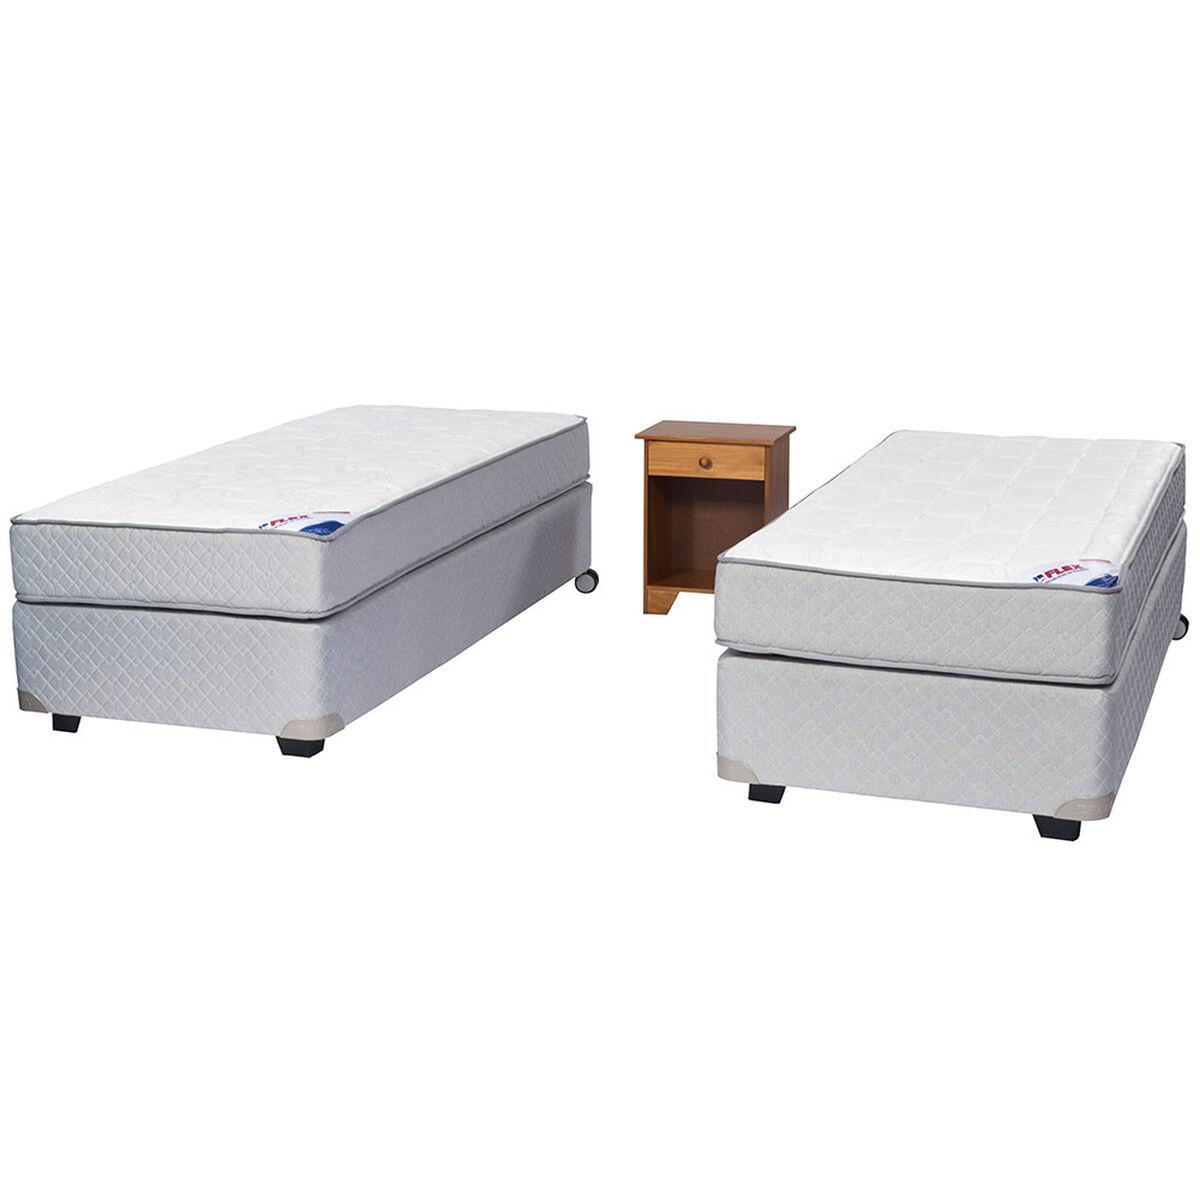 Doble Box Spring Therapedic 1 Pl Flex + Velador Arezo